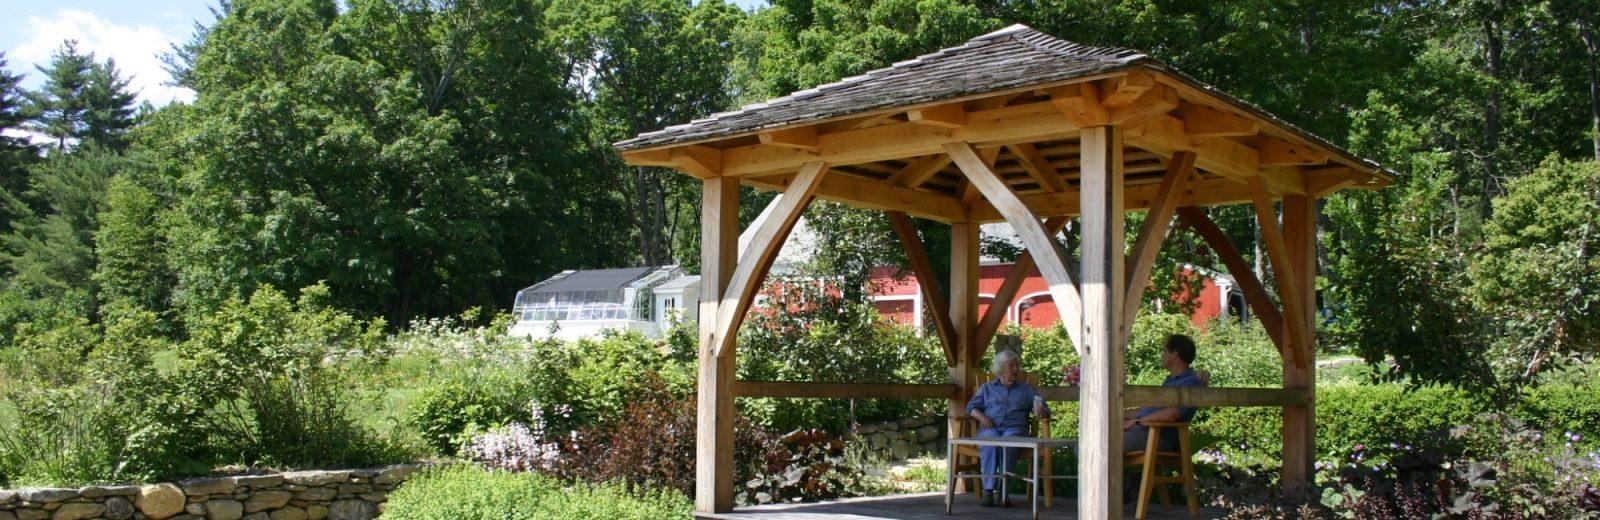 https timberhomesllc com our work outdoor structures